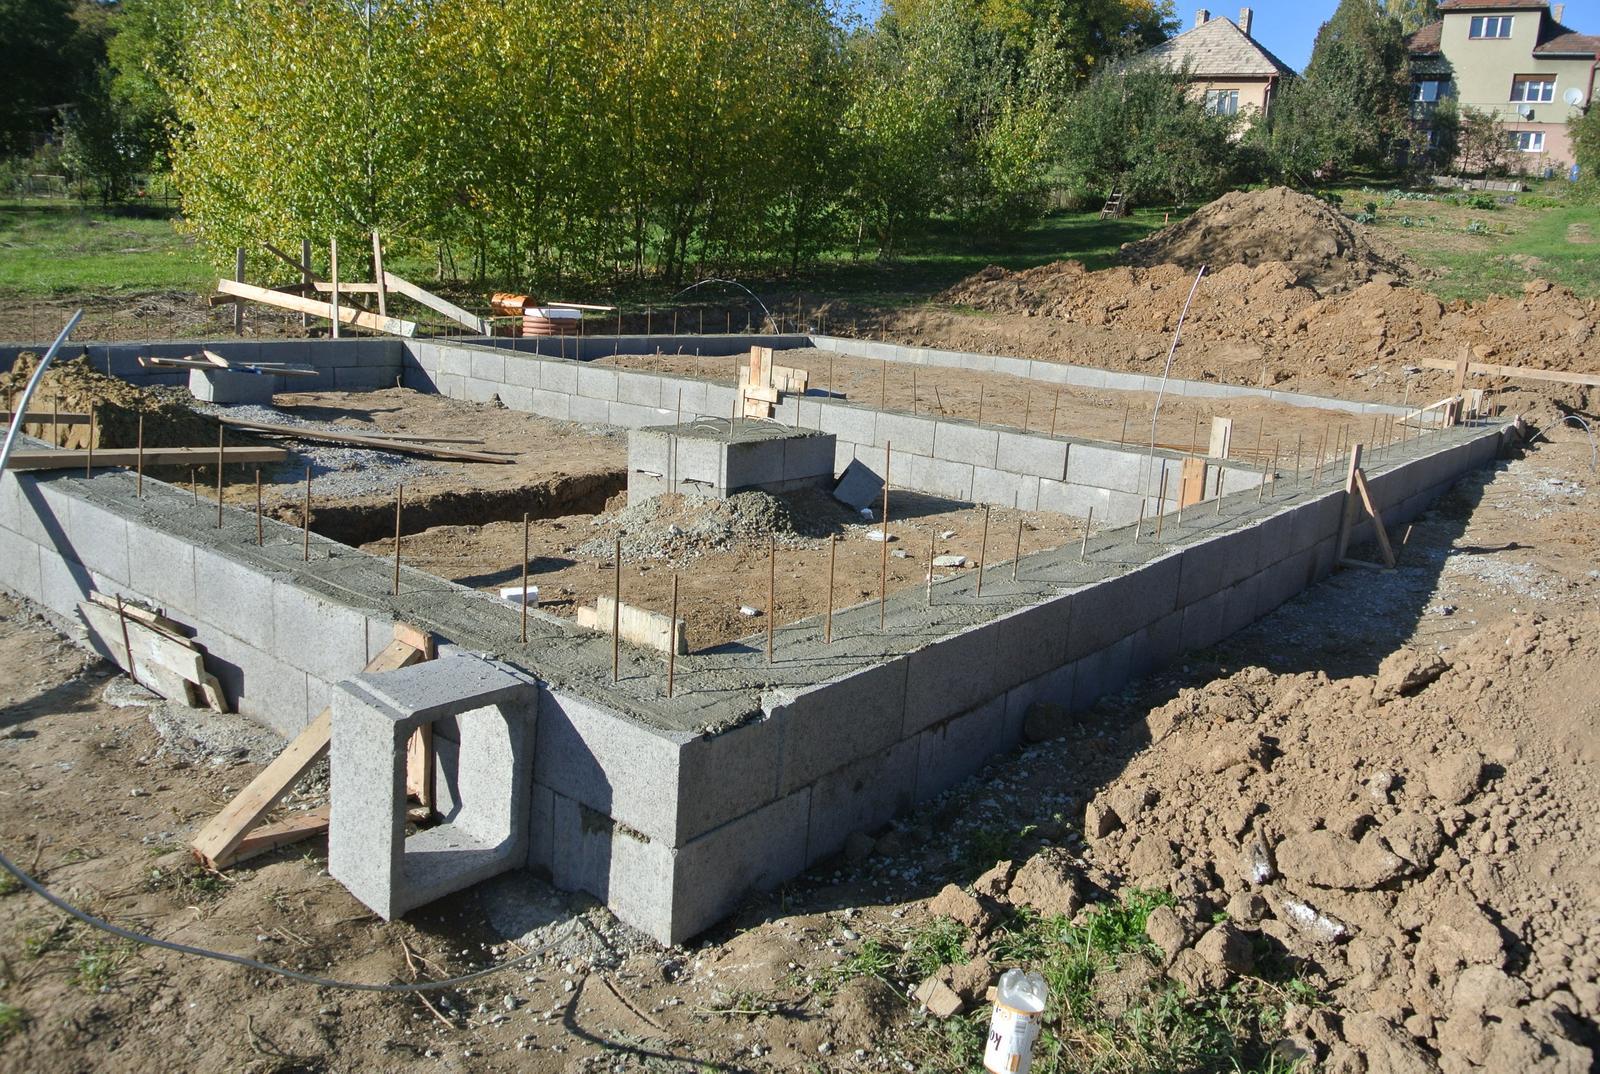 A bude domček ... - Kvoli poruche na betonarke konecne dnes 9.10.2017 zaliate tvarnice.